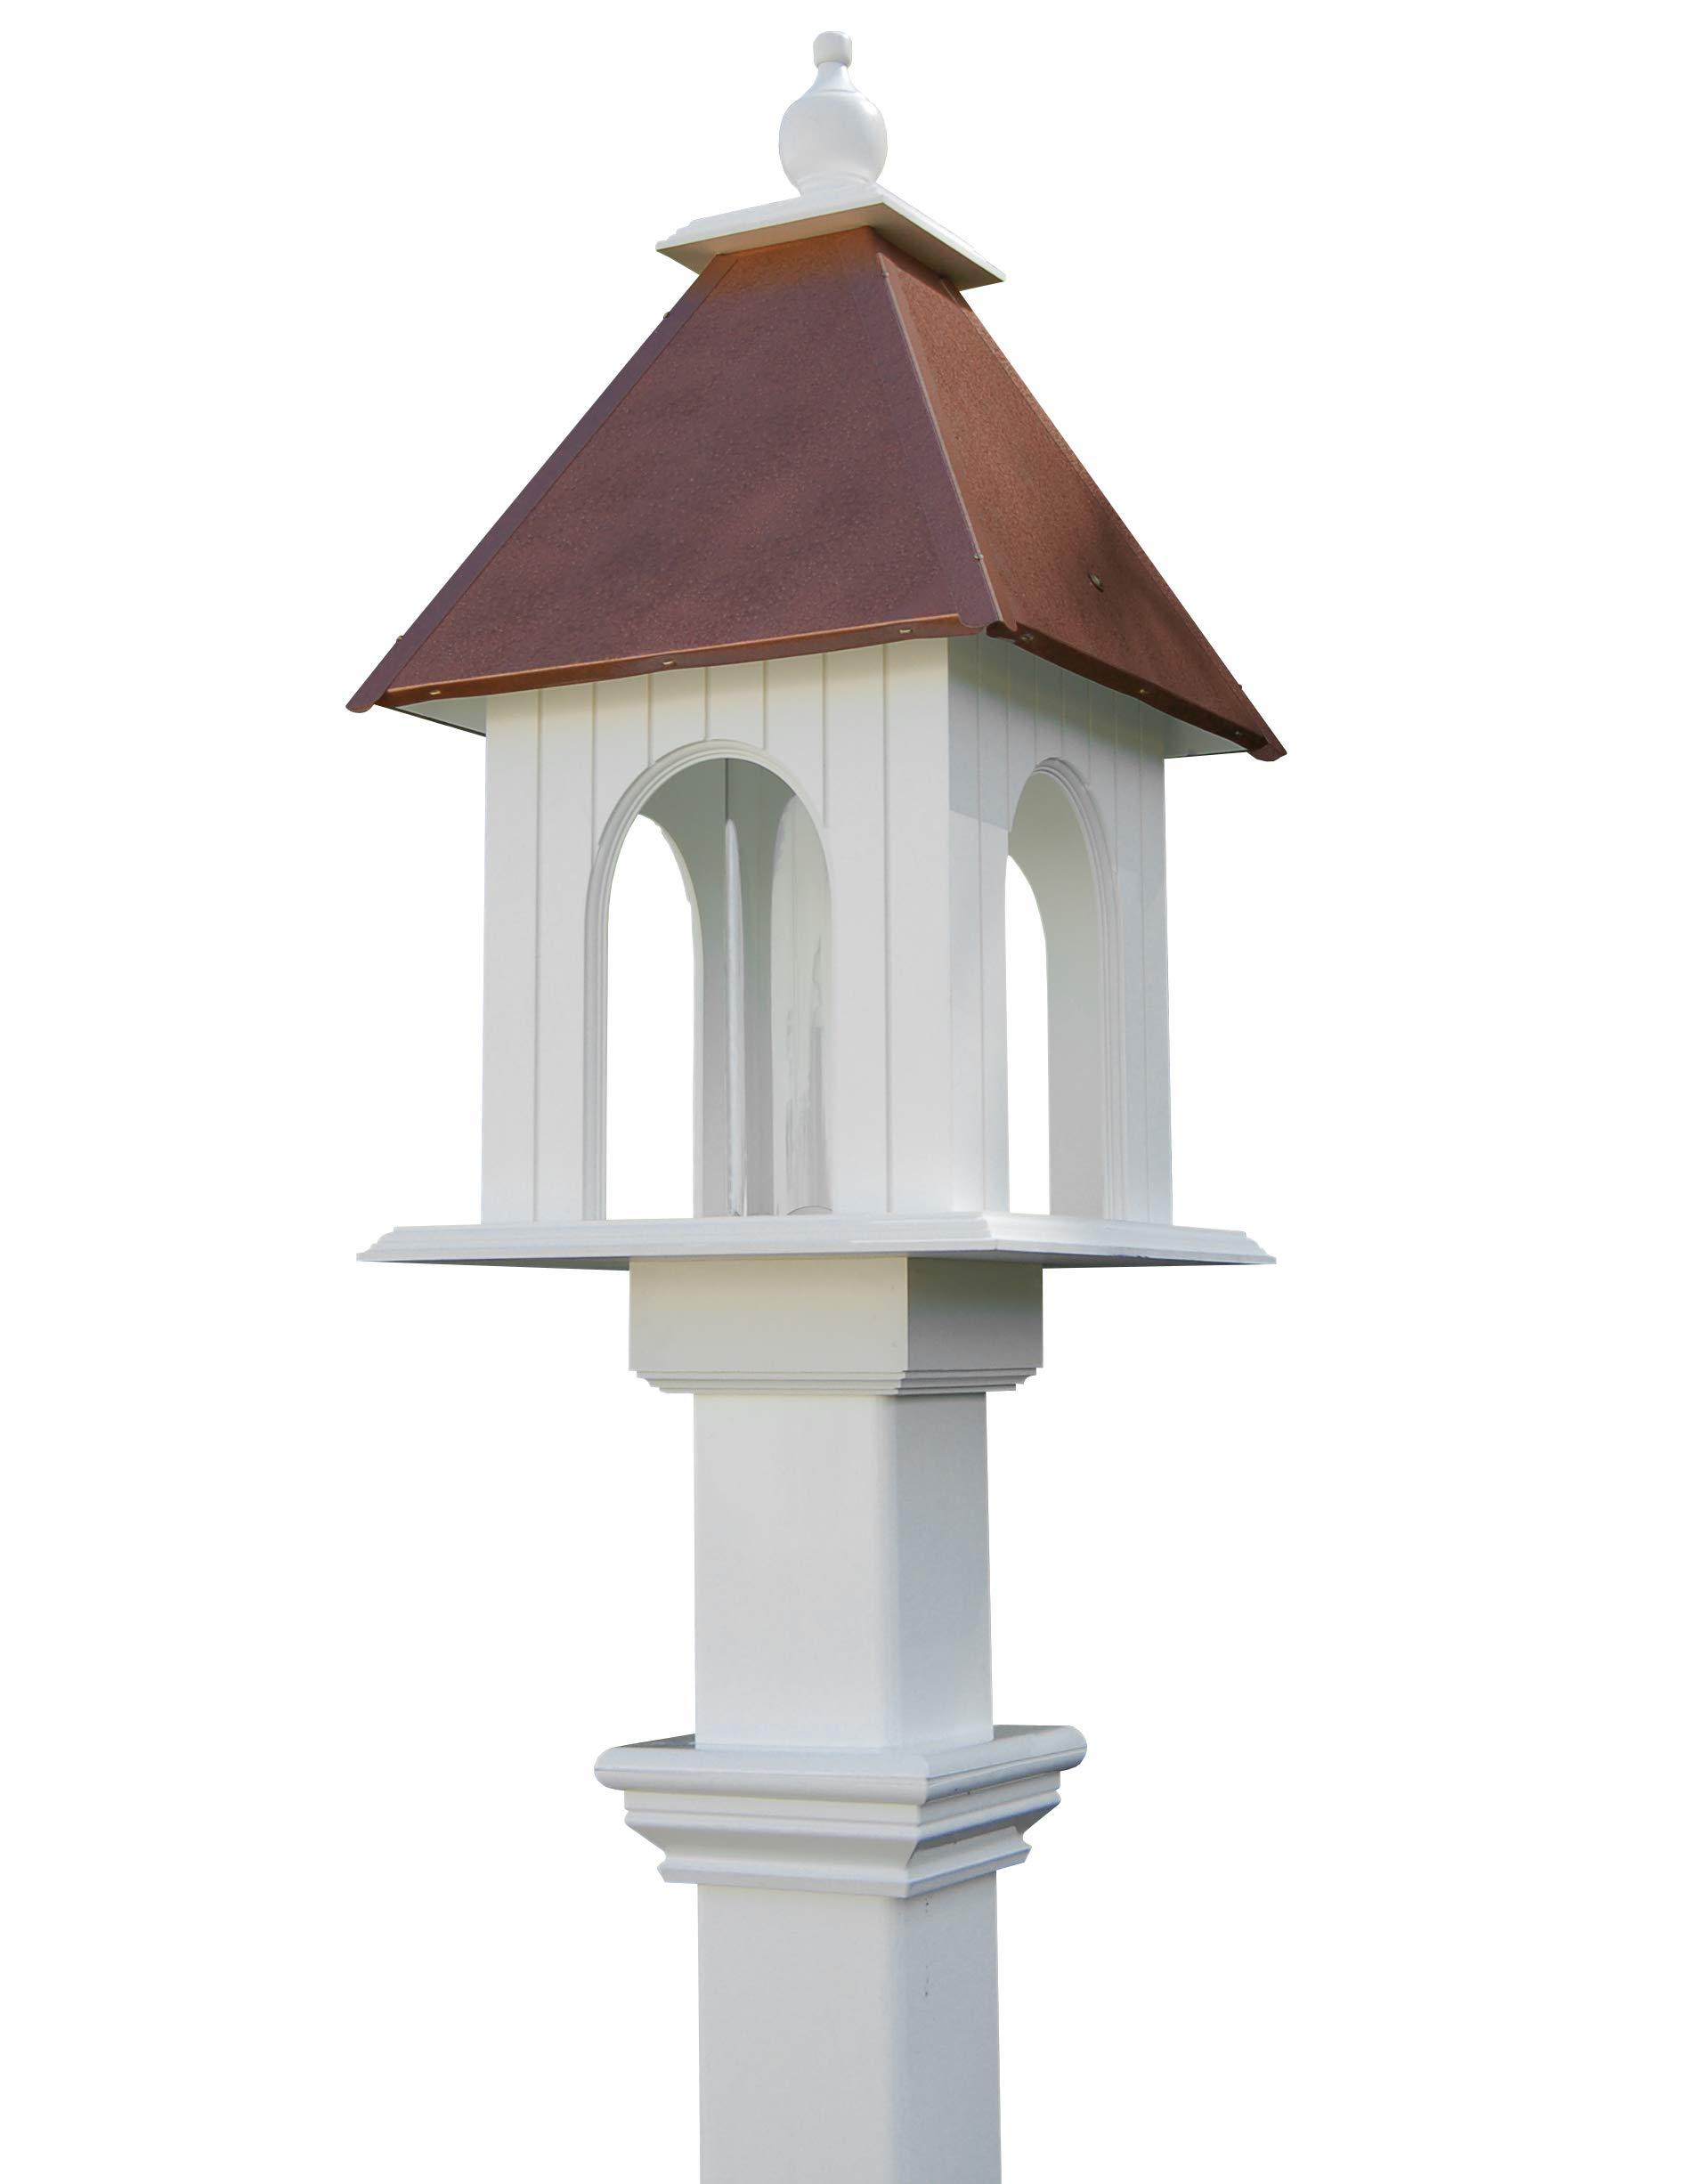 Amazon Com Bestnest Wing A Prayer Dogwood Bird Feeder Hammered Copper Colored Roof Garden Outdoor